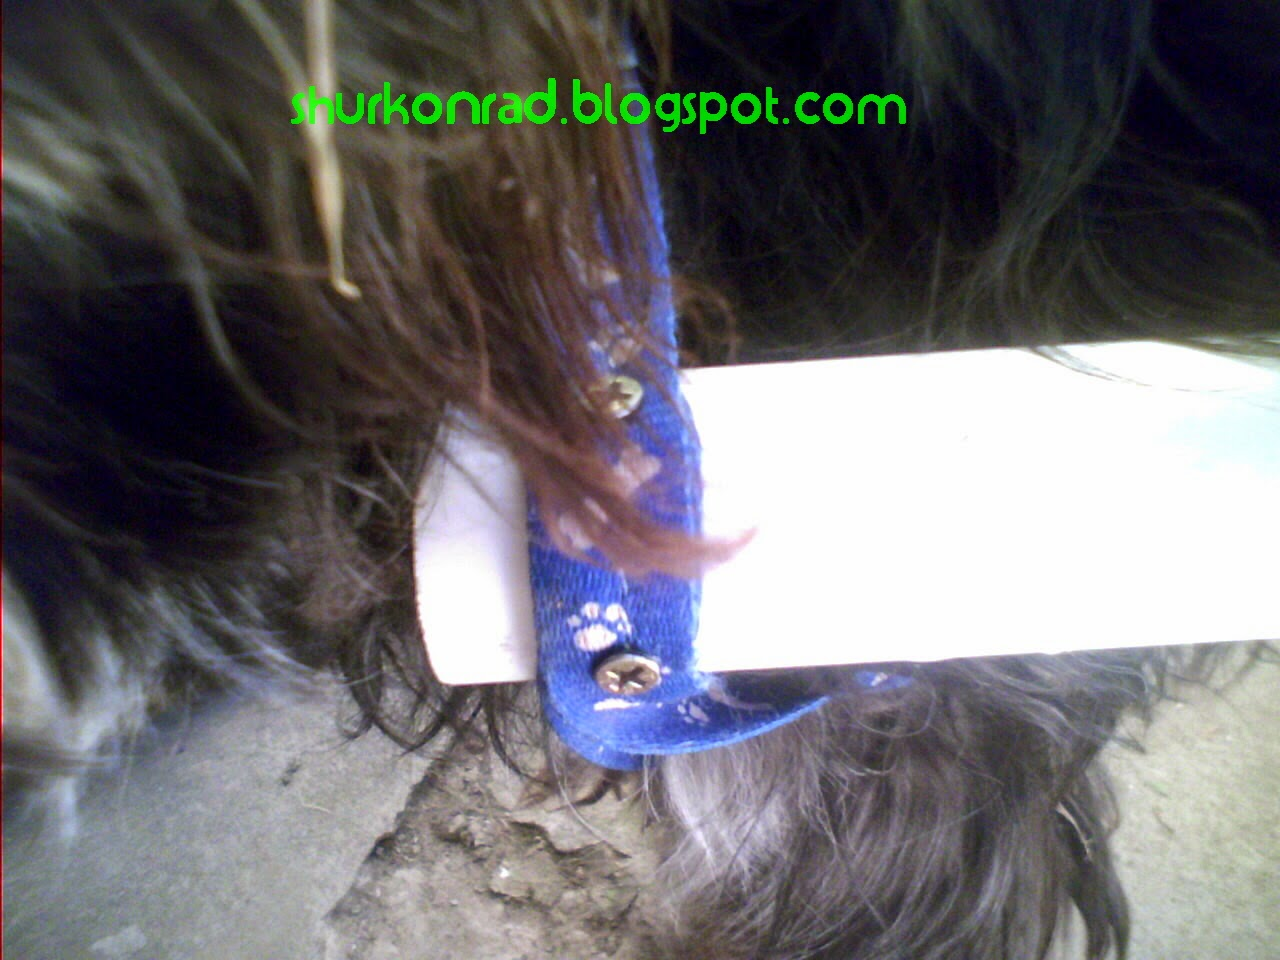 ShurKonrad perro silla ruedas dog 23